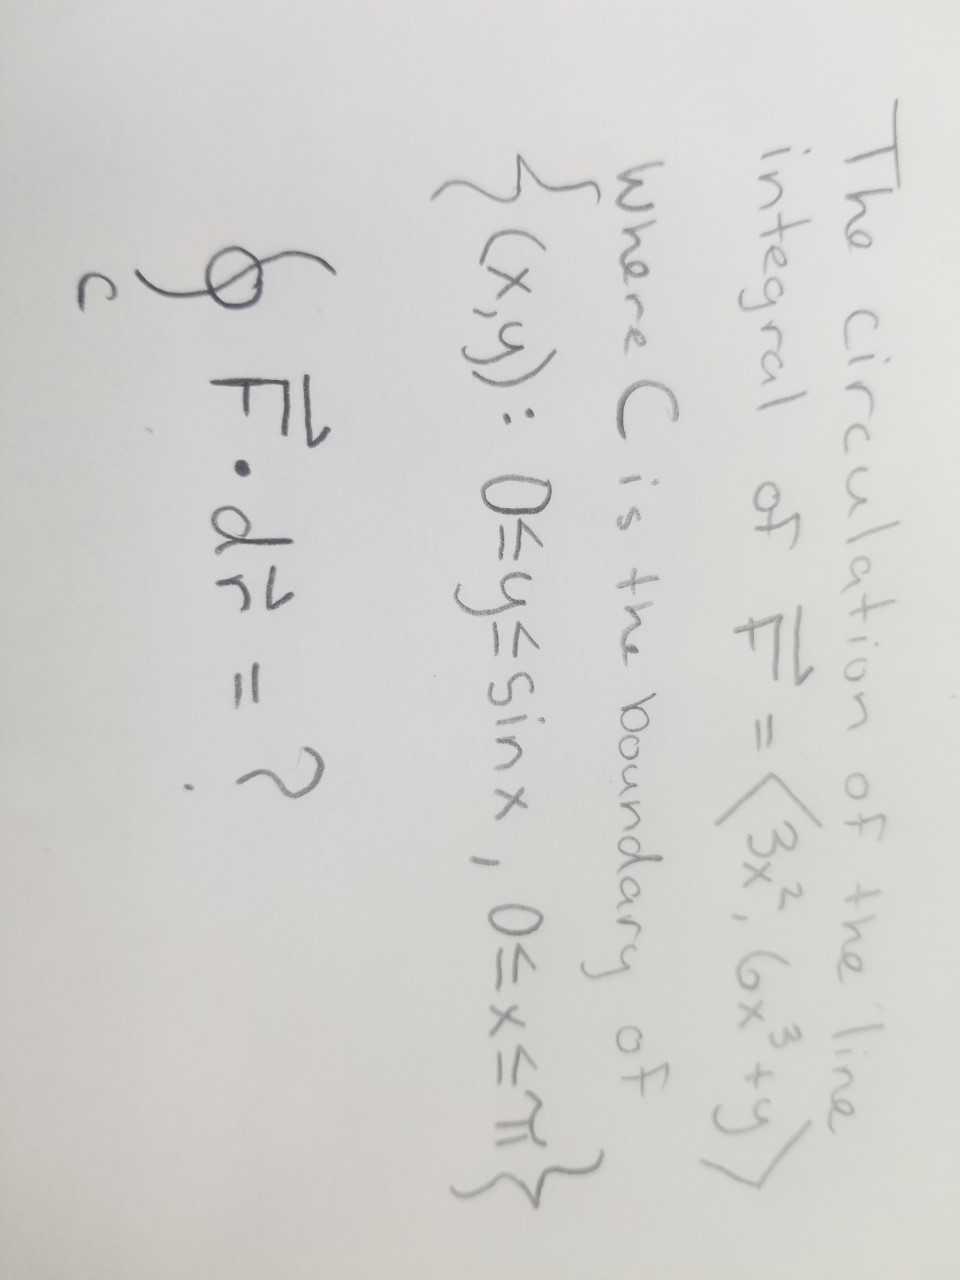 Tho circulation oF Ahe integral 어 F-Qi.GA5) whare C is ihe boundary oF